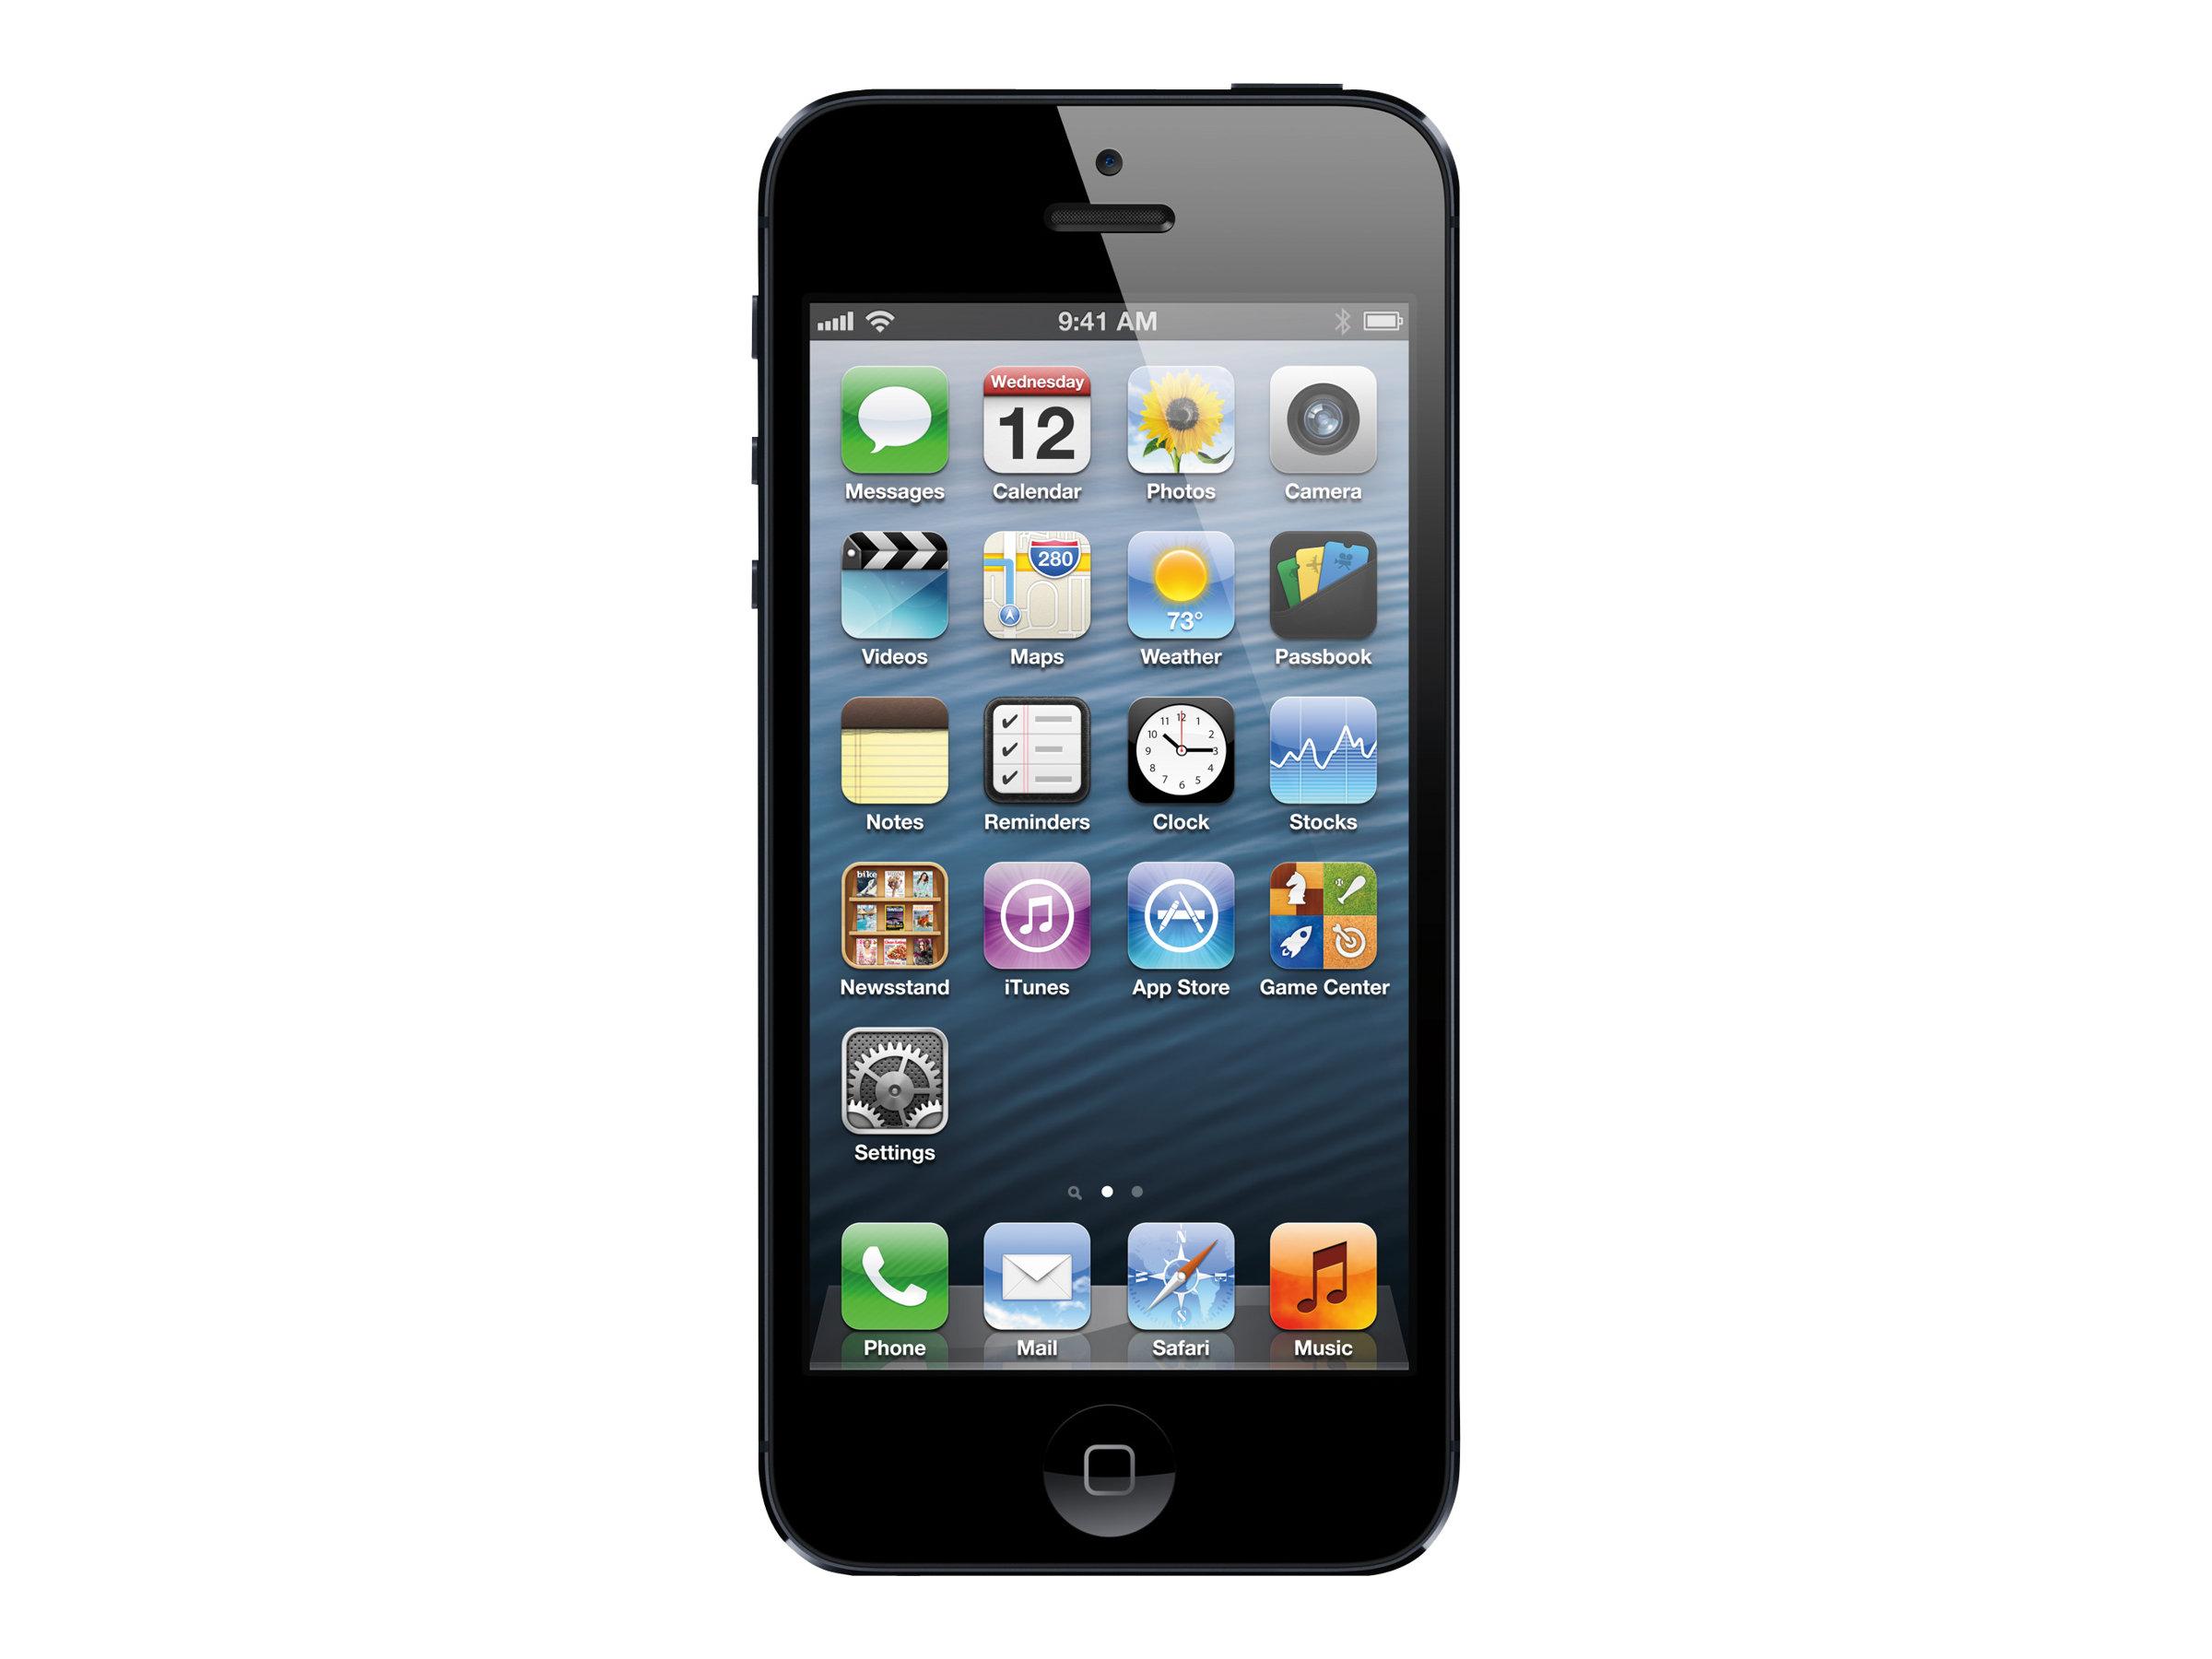 Apple iPhone 5 - noir et ardoise - 4G LTE - 16 Go - GSM - smartphone